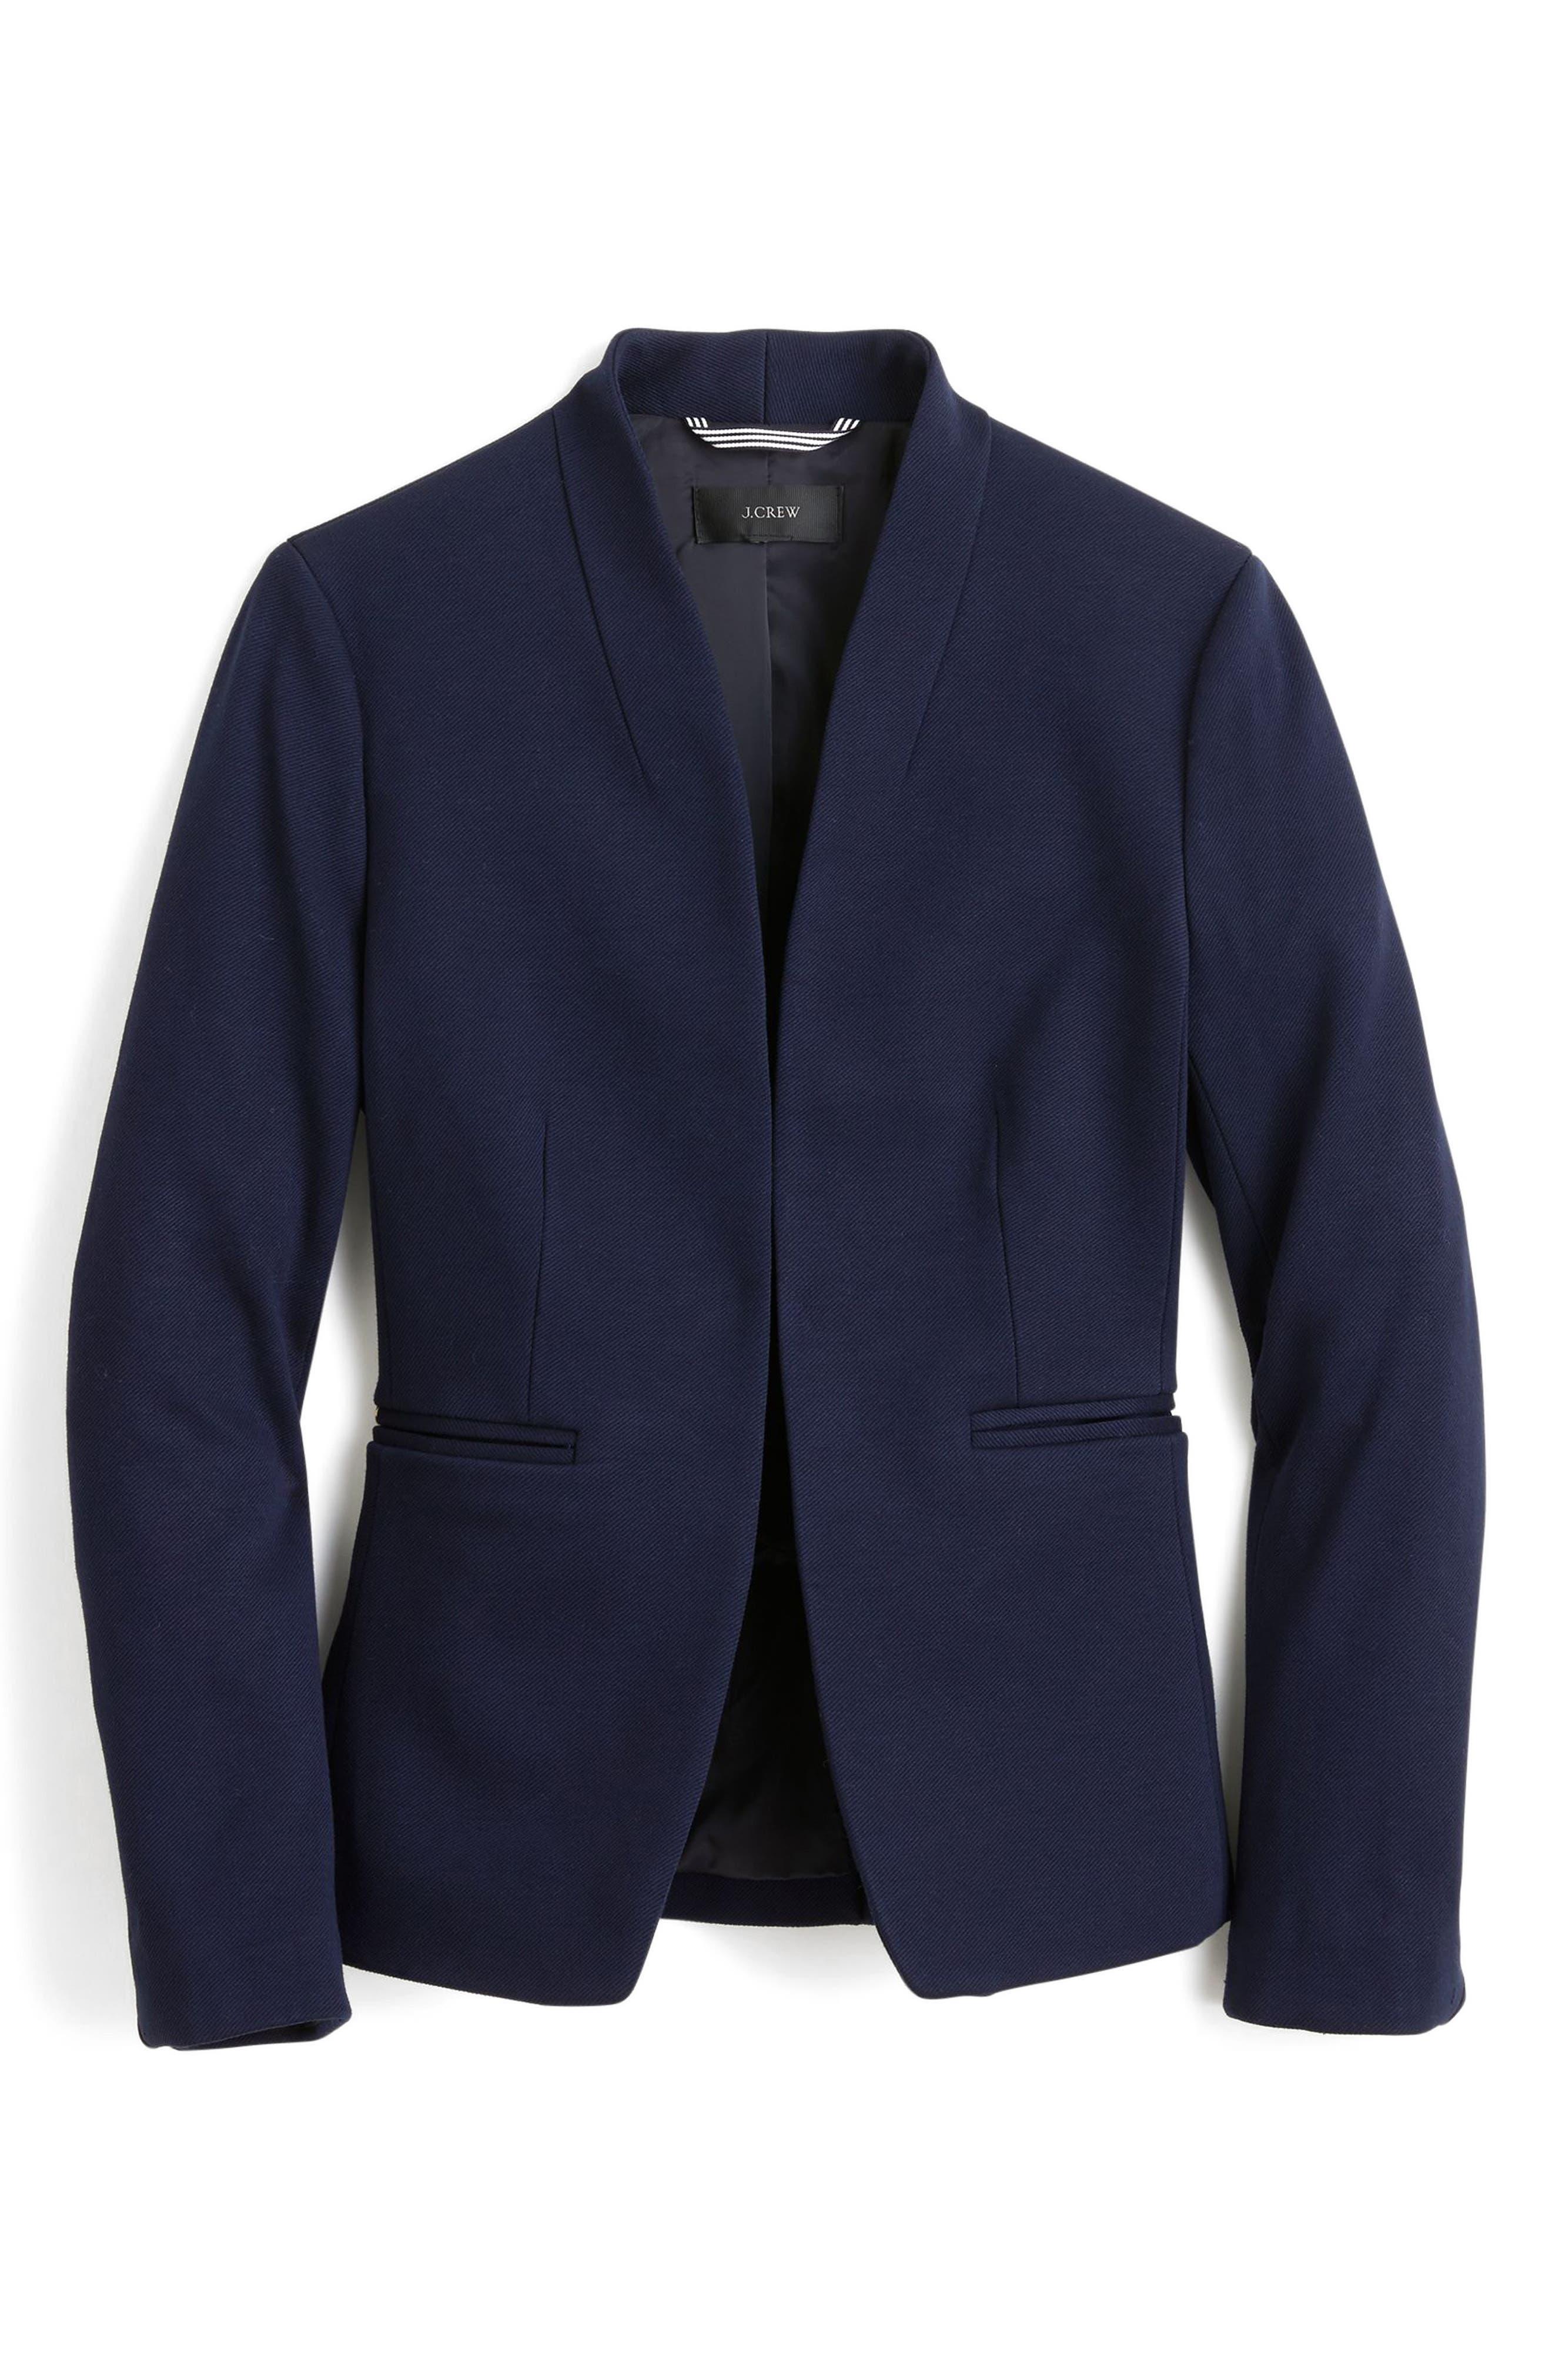 77b1e5c3127 Women s J.Crew Coats   Jackets